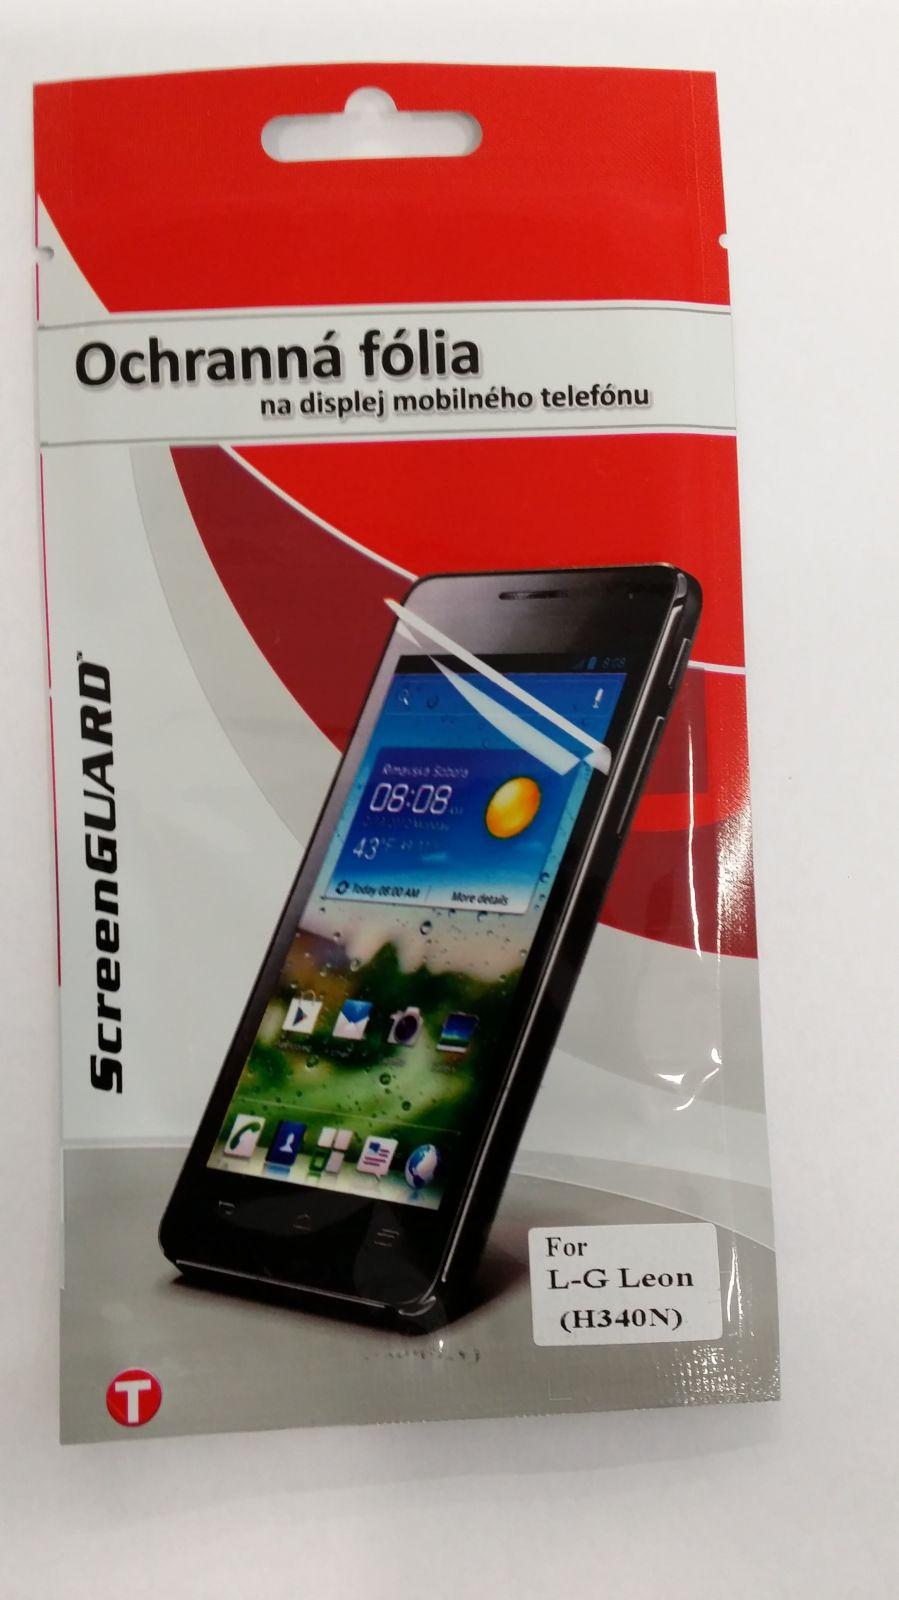 Ochranná folie Mobilnet LG Leon/H340N